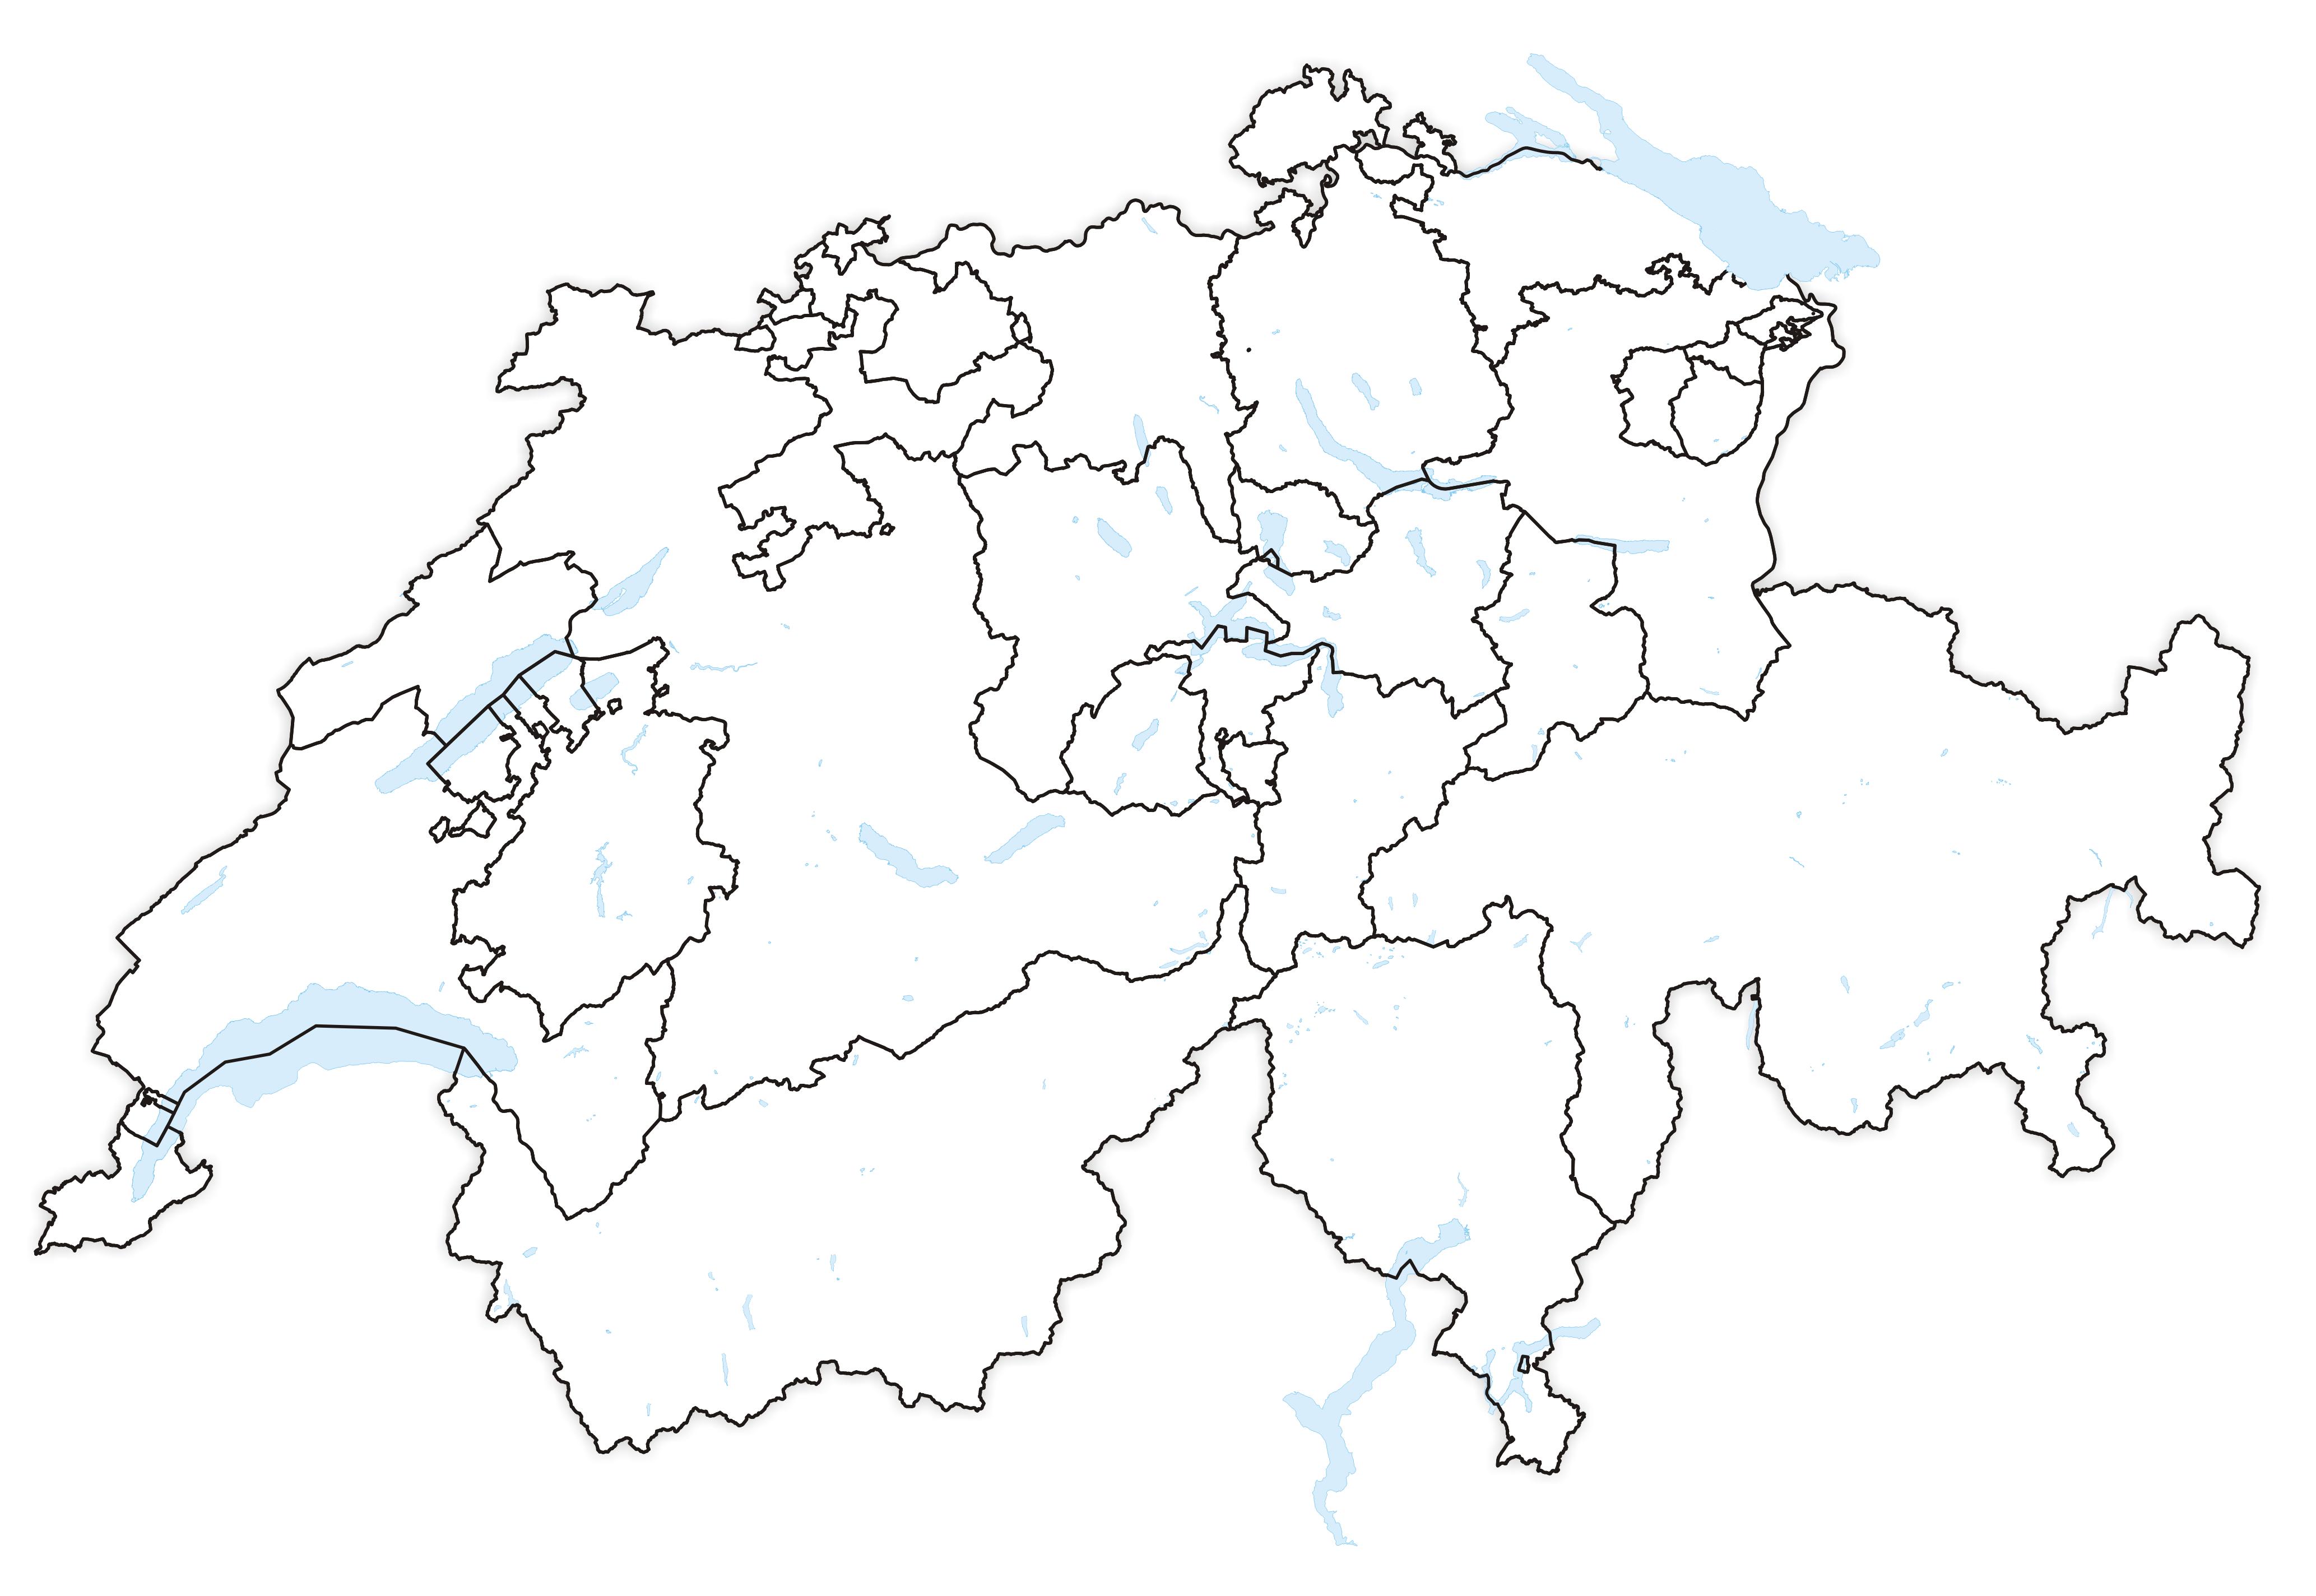 filekarte kantone der schweiz 1815png